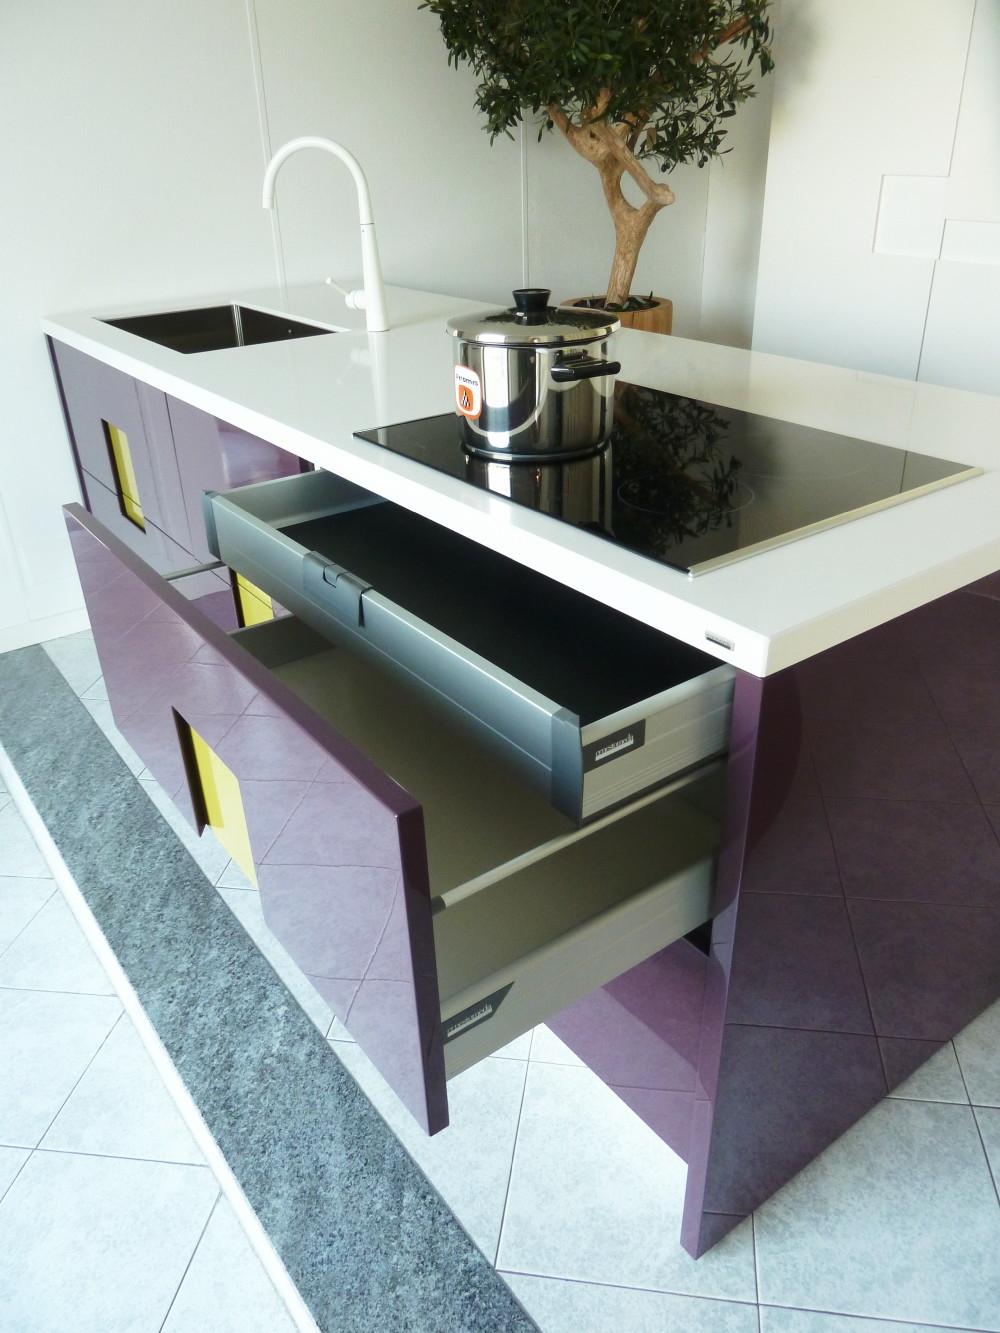 Emejing top cucina quarzo prezzi contemporary - Top cucina in quarzo ...